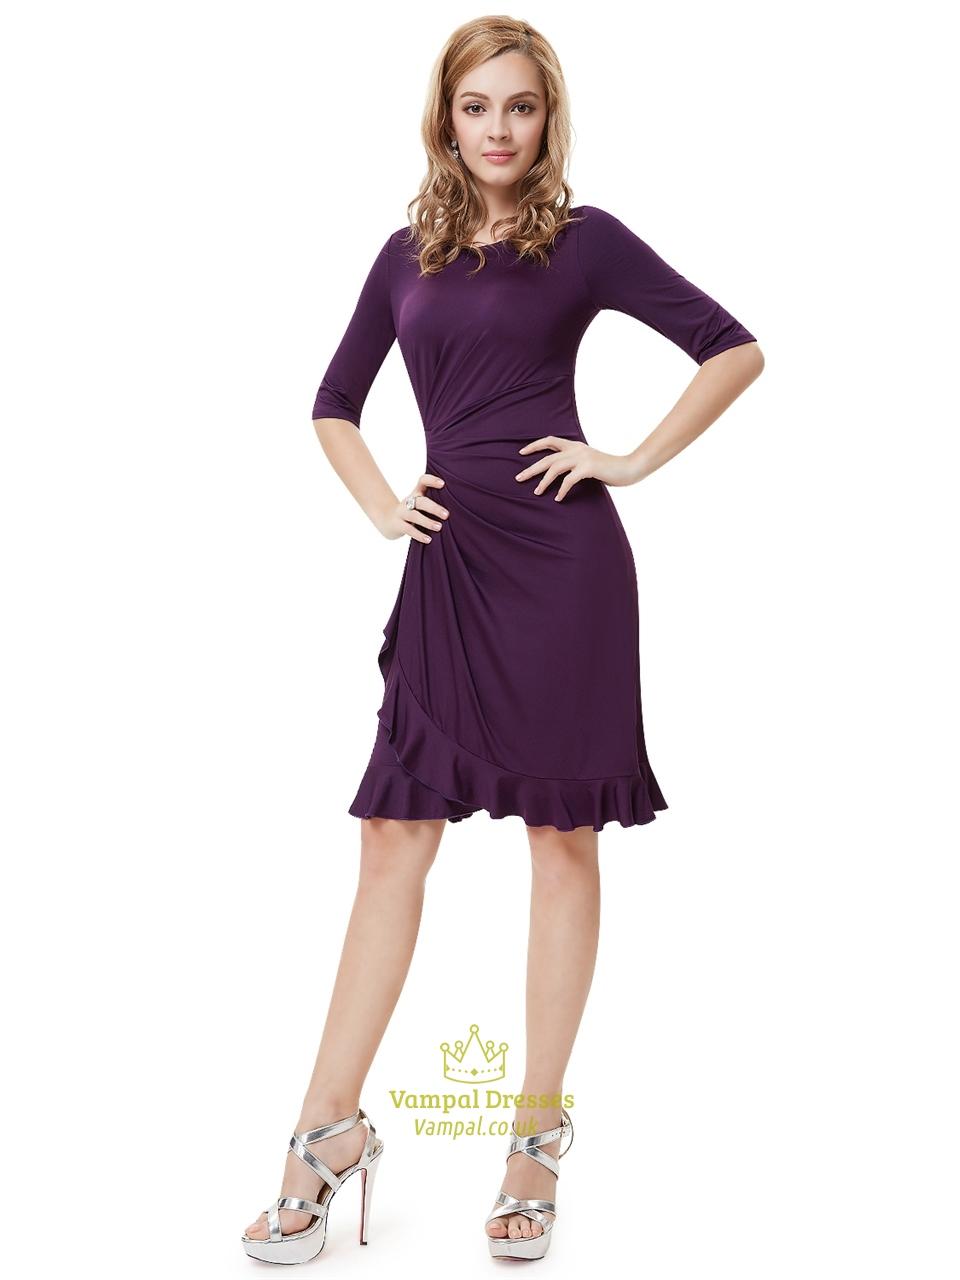 Grape Sheath Chiffon Knee Length Cocktail Dresses With Half Sleeve | Vampal Dresses